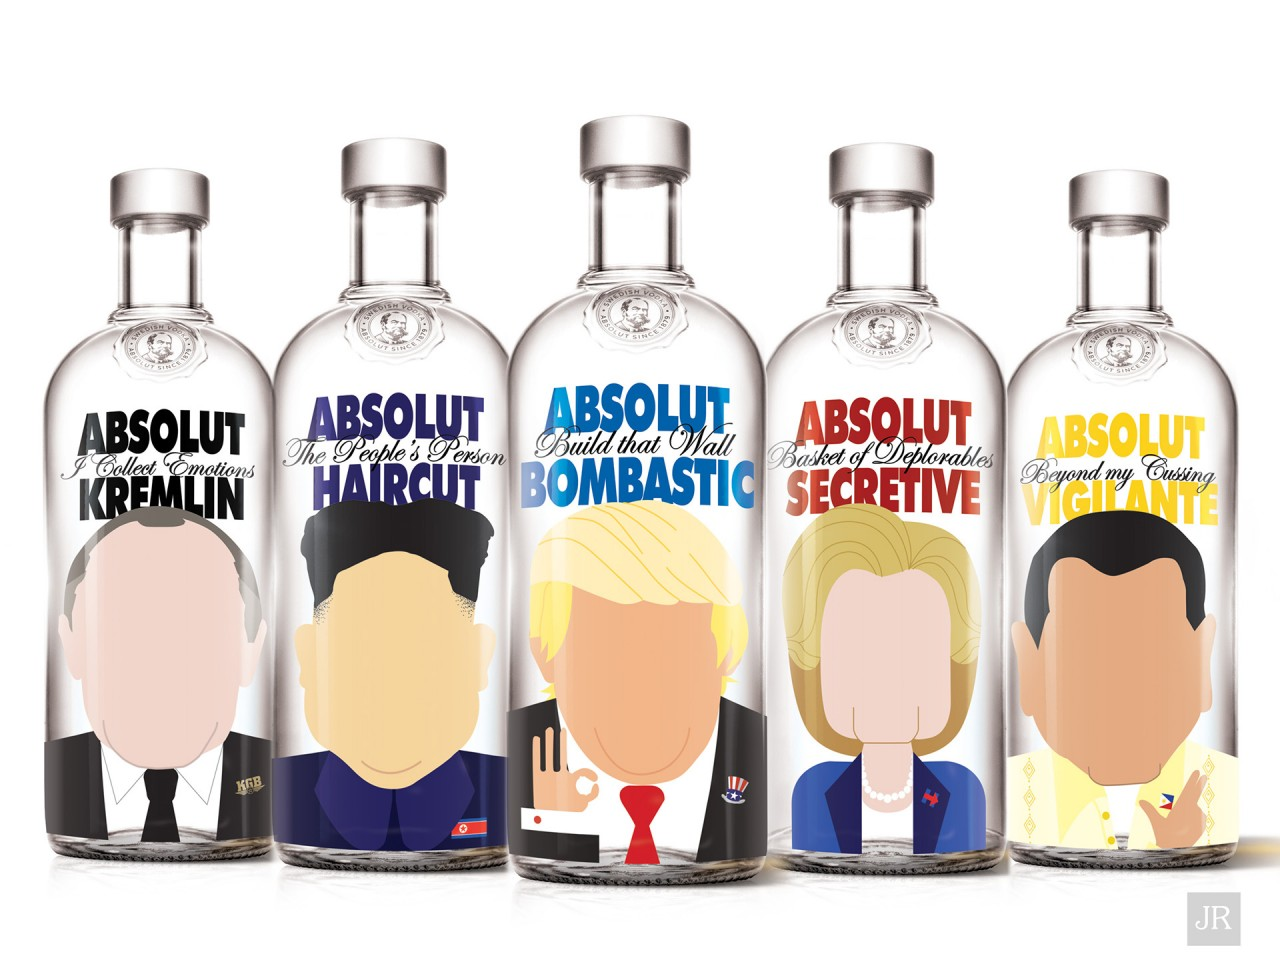 Absolut Vodka bottles reimagined as world leaders photo